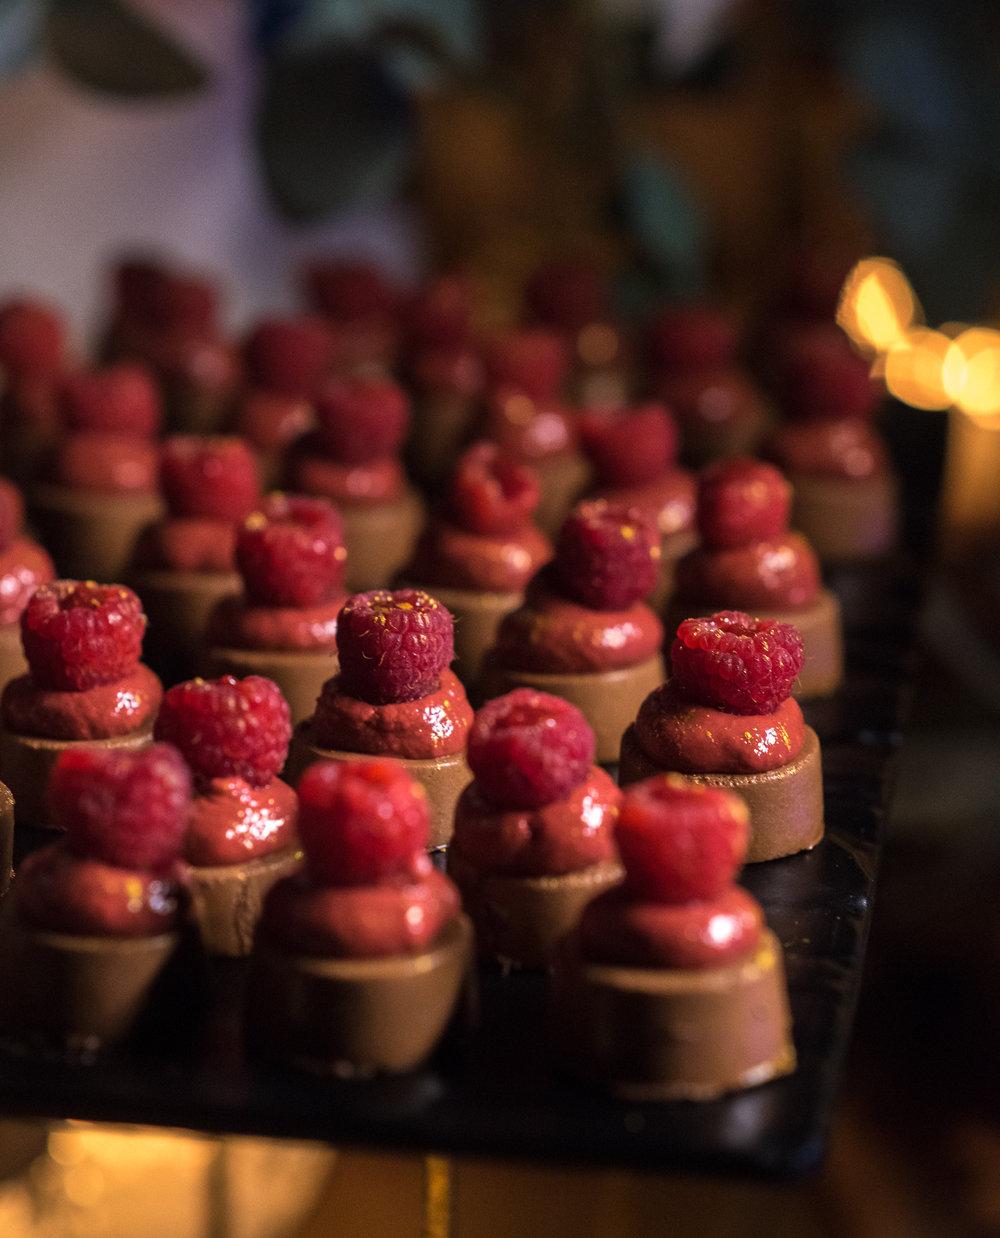 santorini-island-greece-wedding-dinner-celebration-groom-bride-sunset-wedding-table-crystal-charger-plate-flower-arrangement-dessert-table-fairy-lights-mini-bulbs-rocabella-hotel-silkentile-event-planning-firm